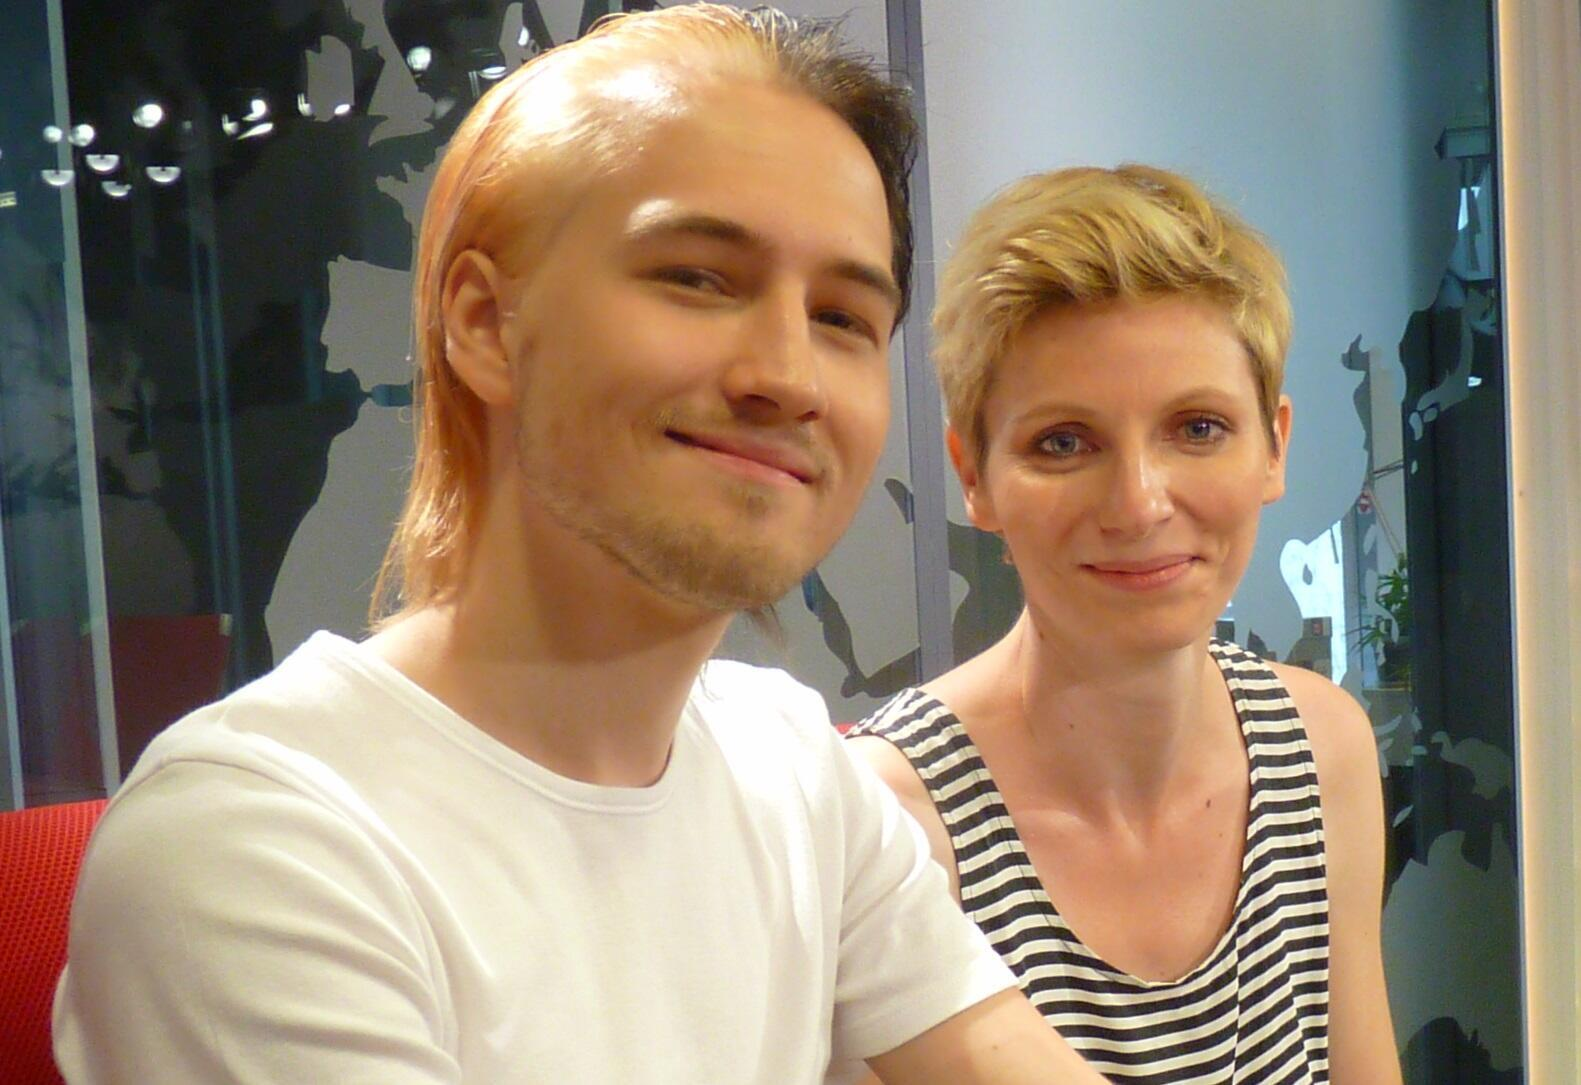 Uwe Arndt y Amlexandra Manginot en los estudios de RFI